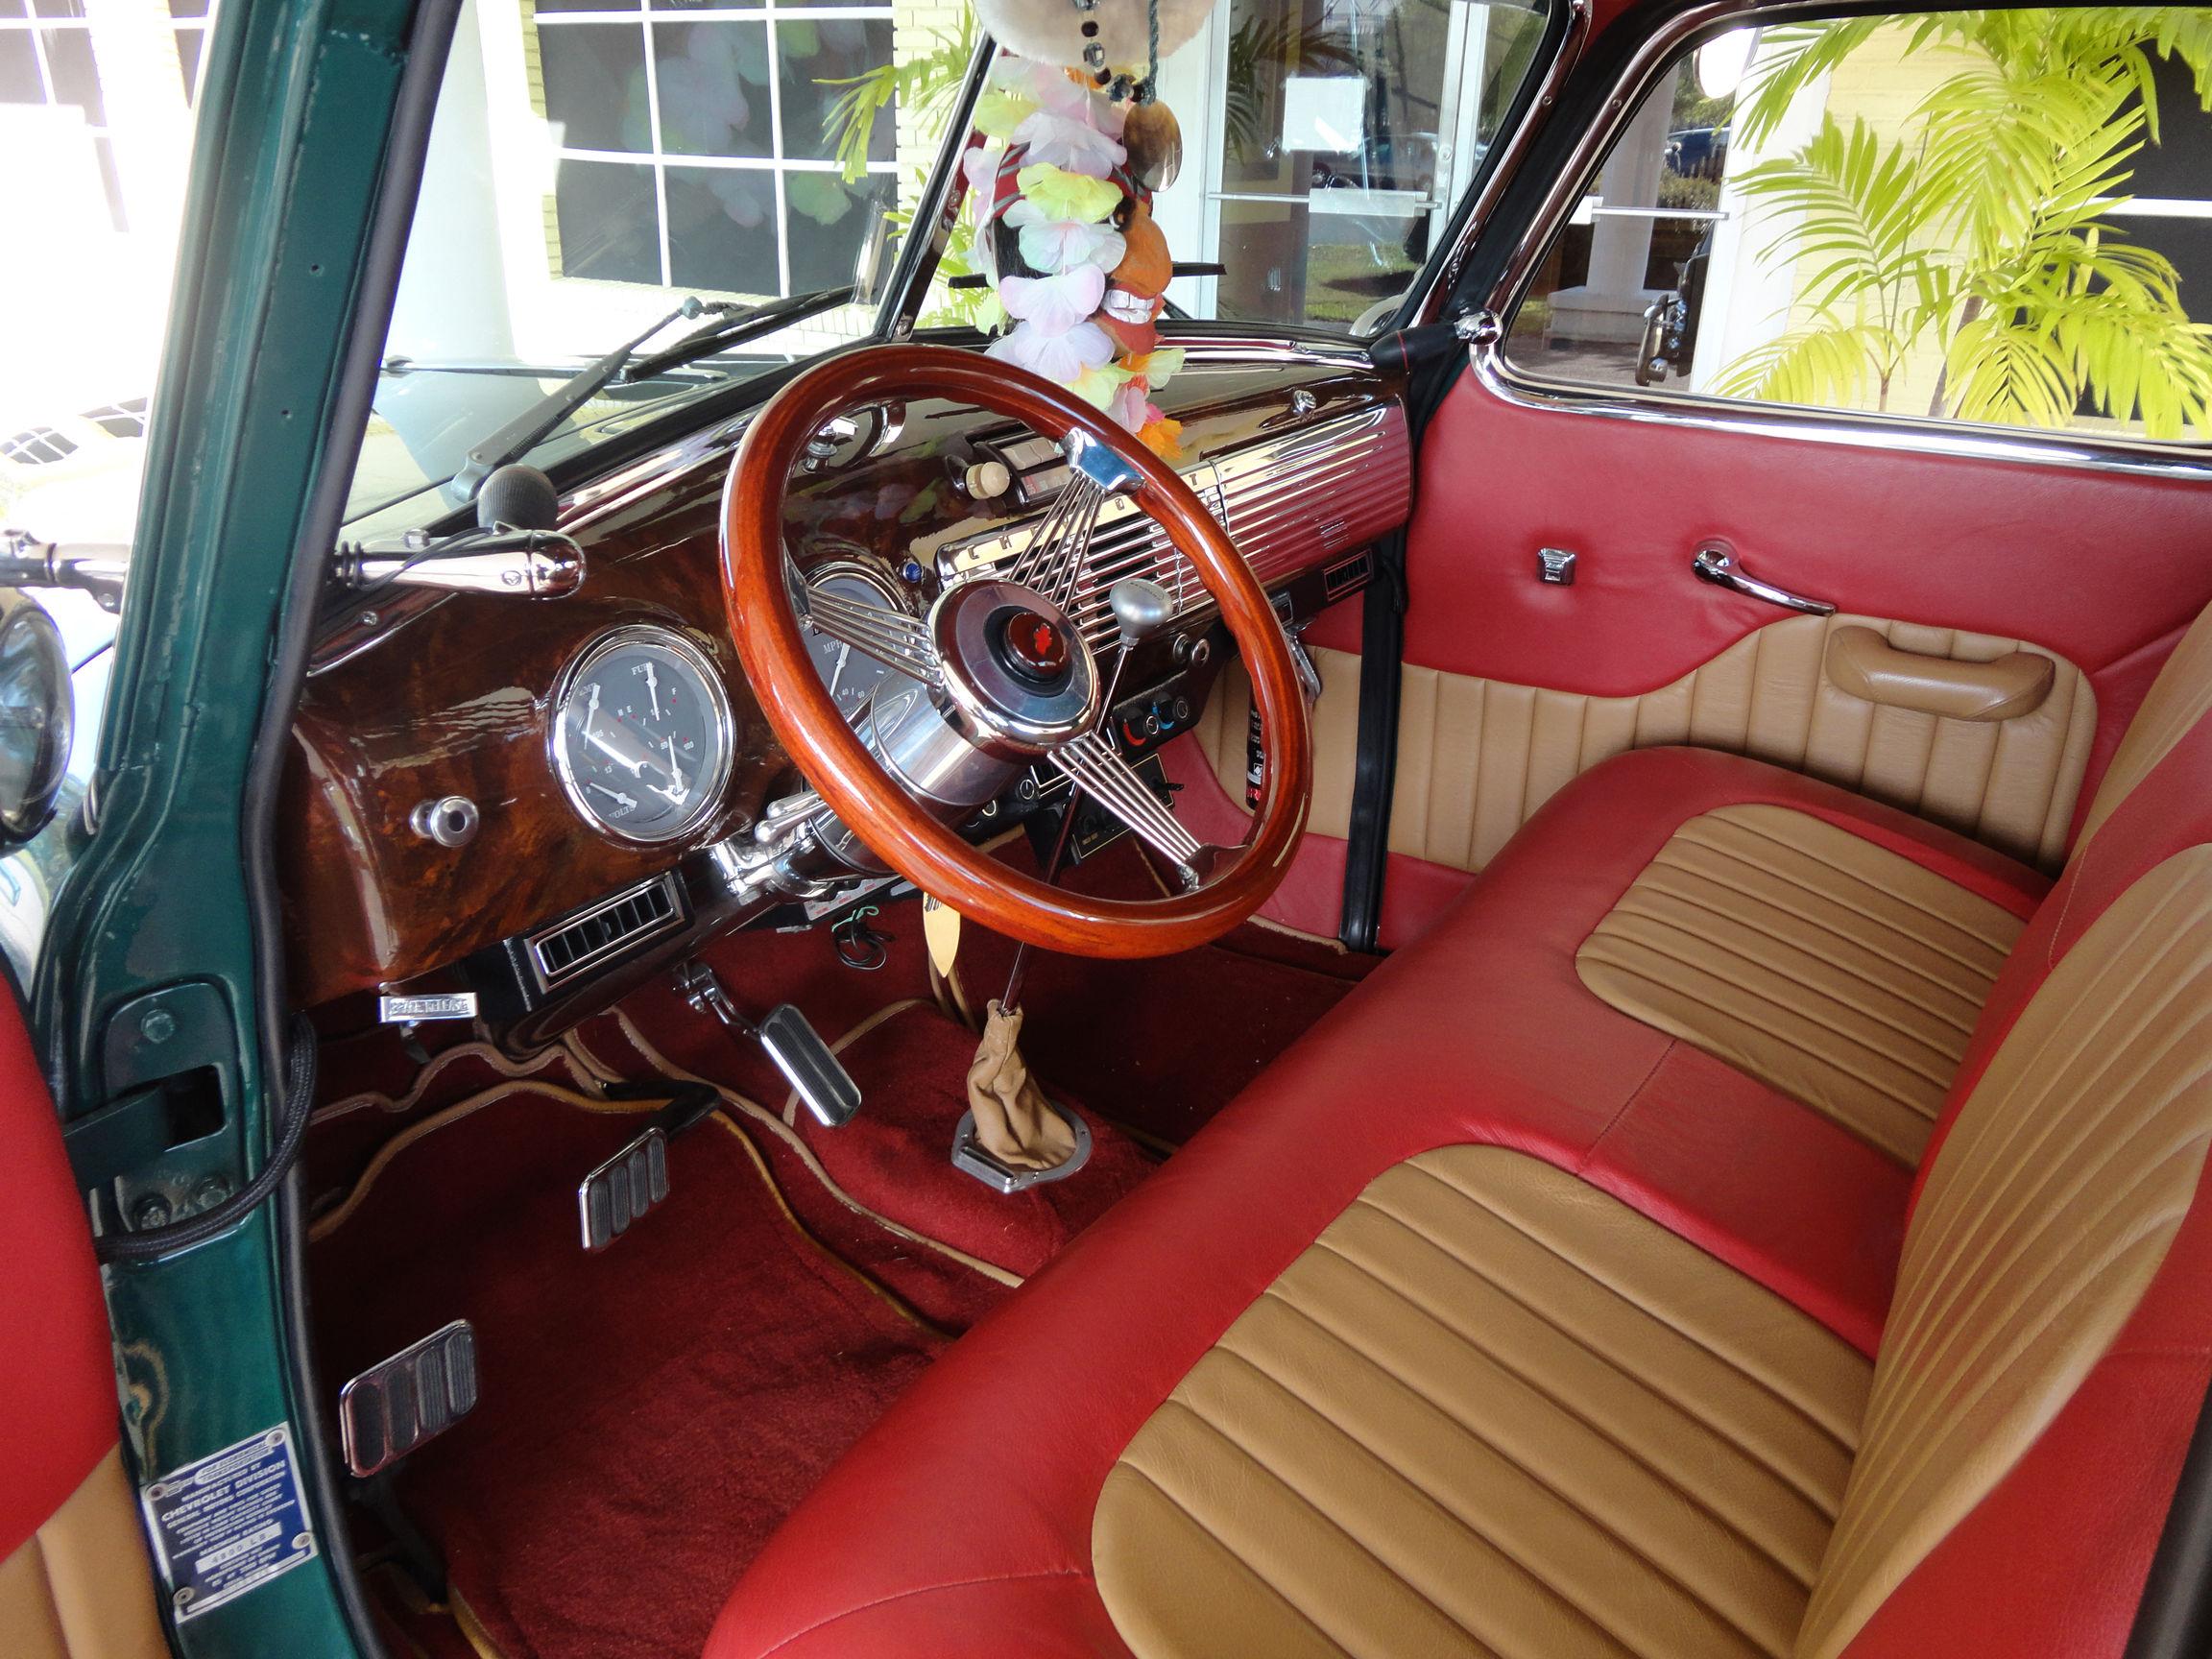 1950 Chevrolet 3100 Custom Woody Pickup Retro Interior H Wallpaper 2304x1728 173742 Wallpaperup